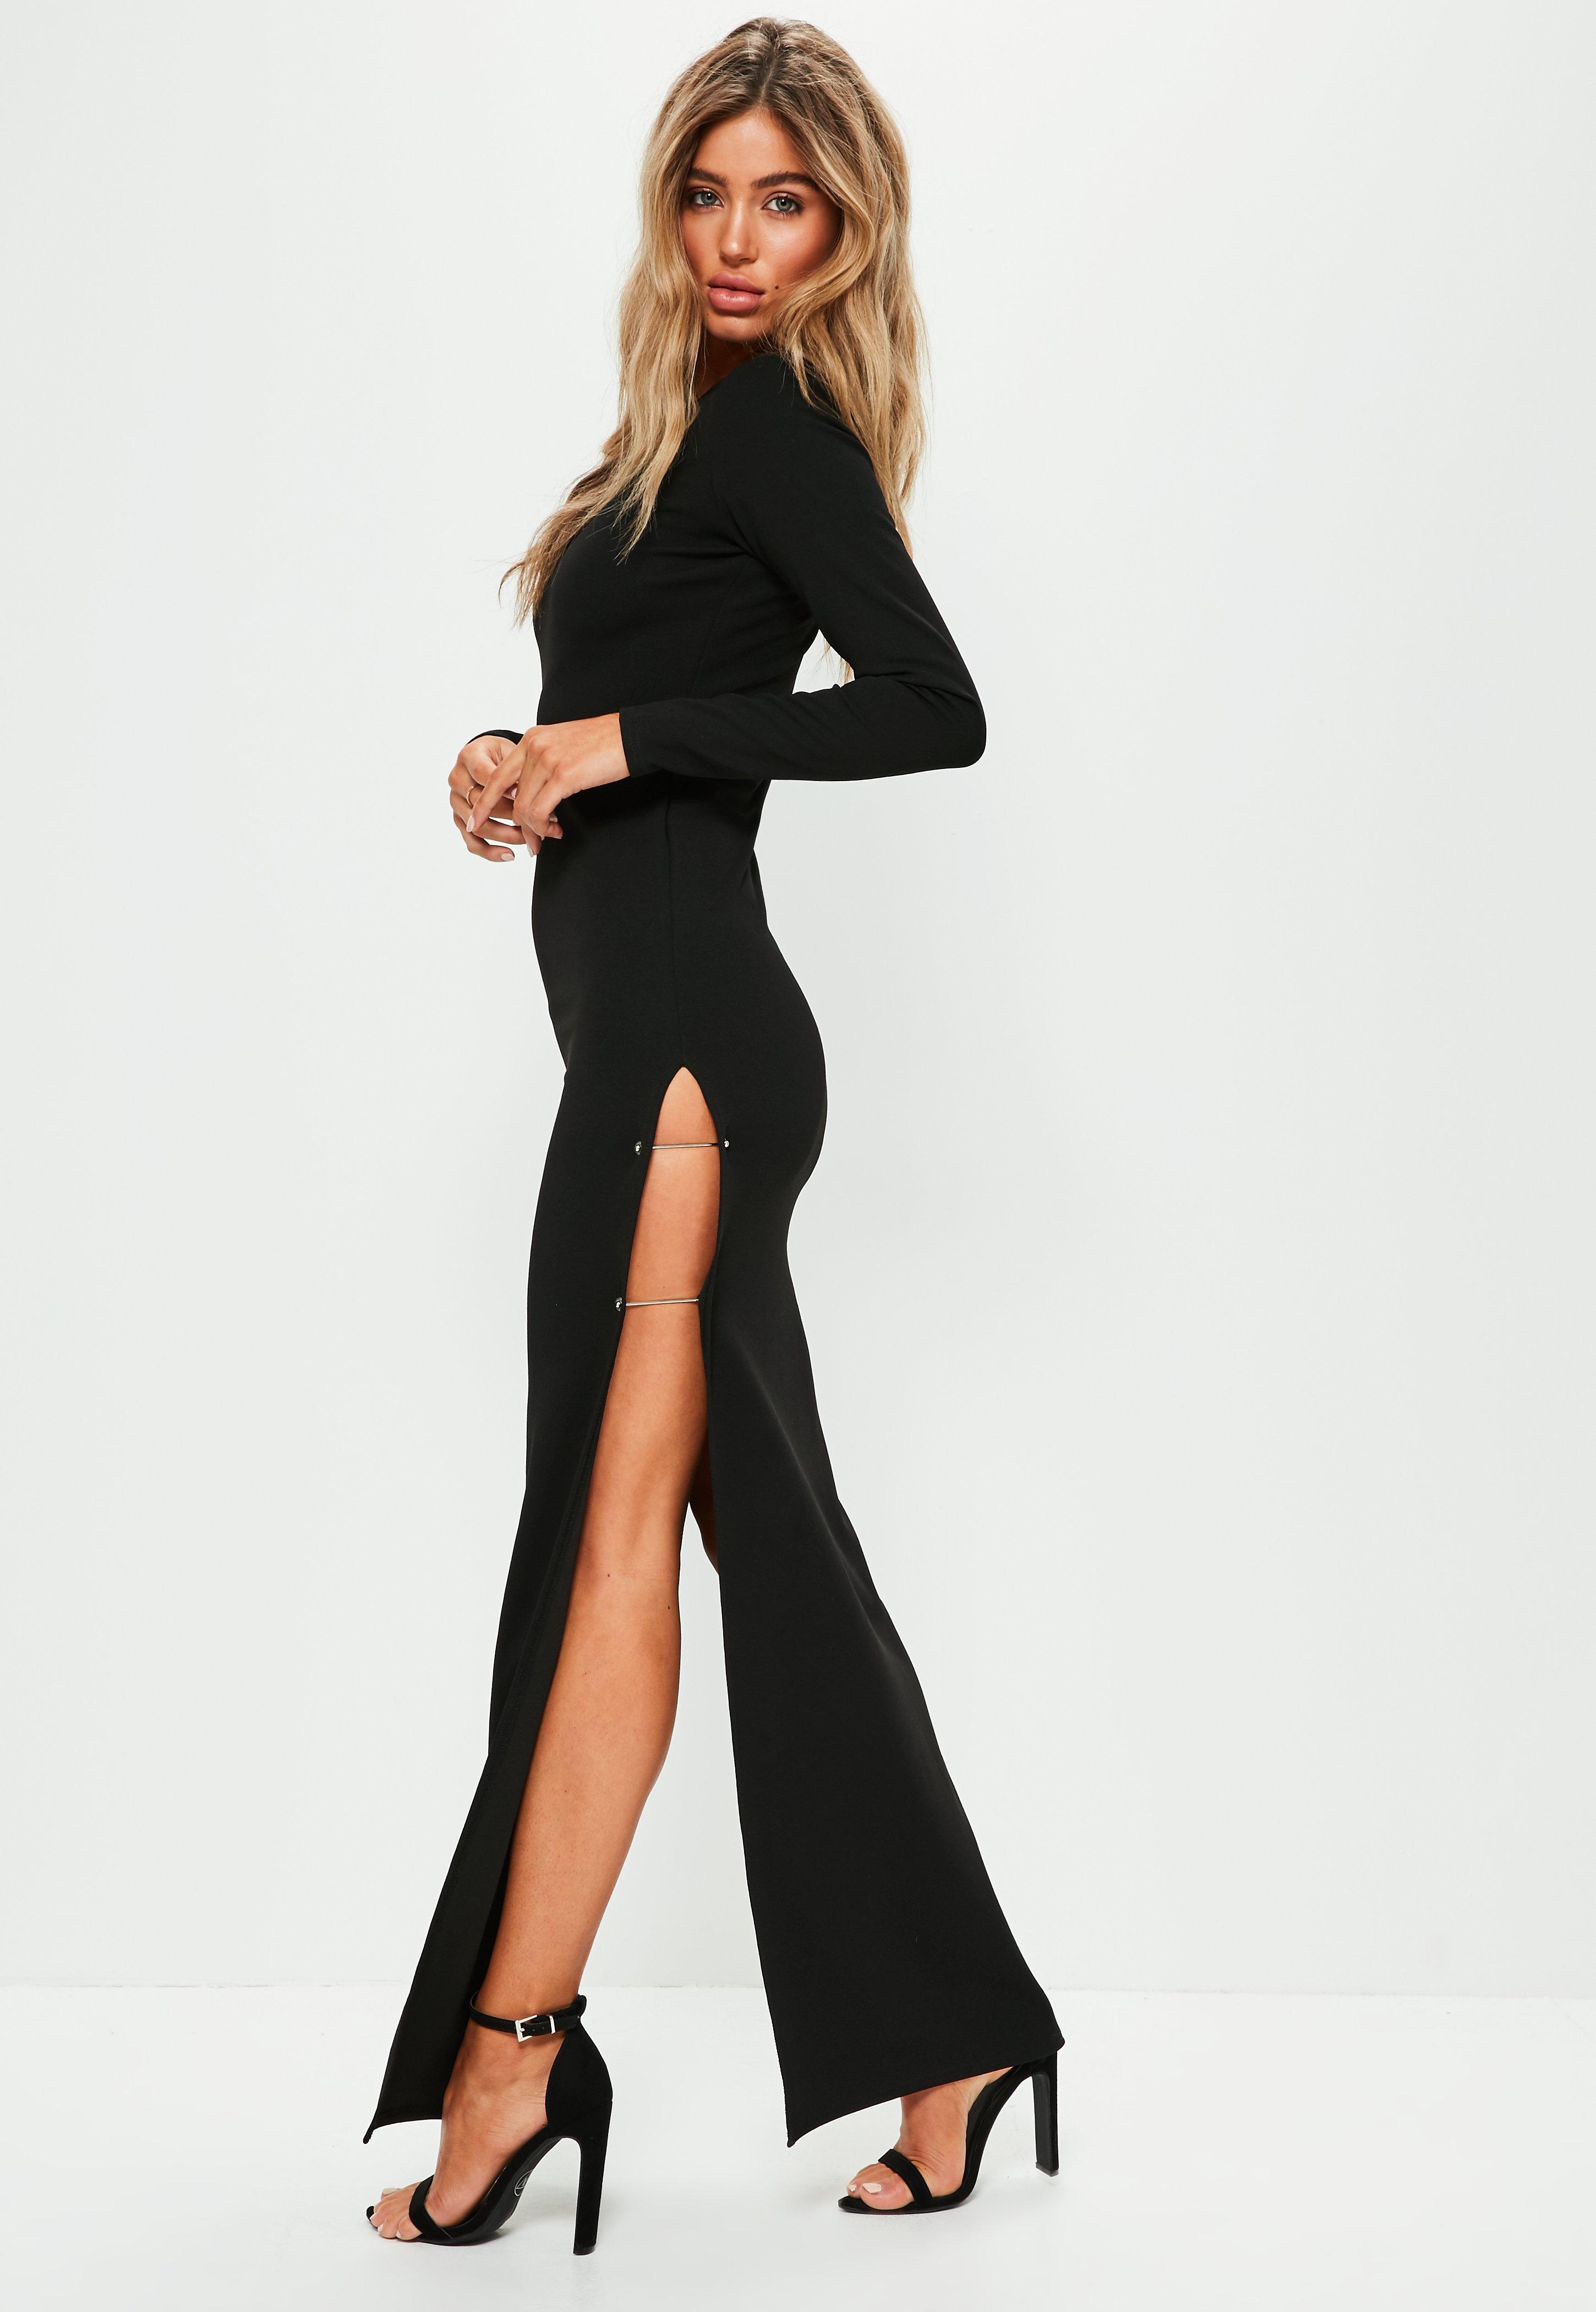 Wedding Senior Prom Dresses prom dresses womens formal missguided black thigh split metal bar maxi dress